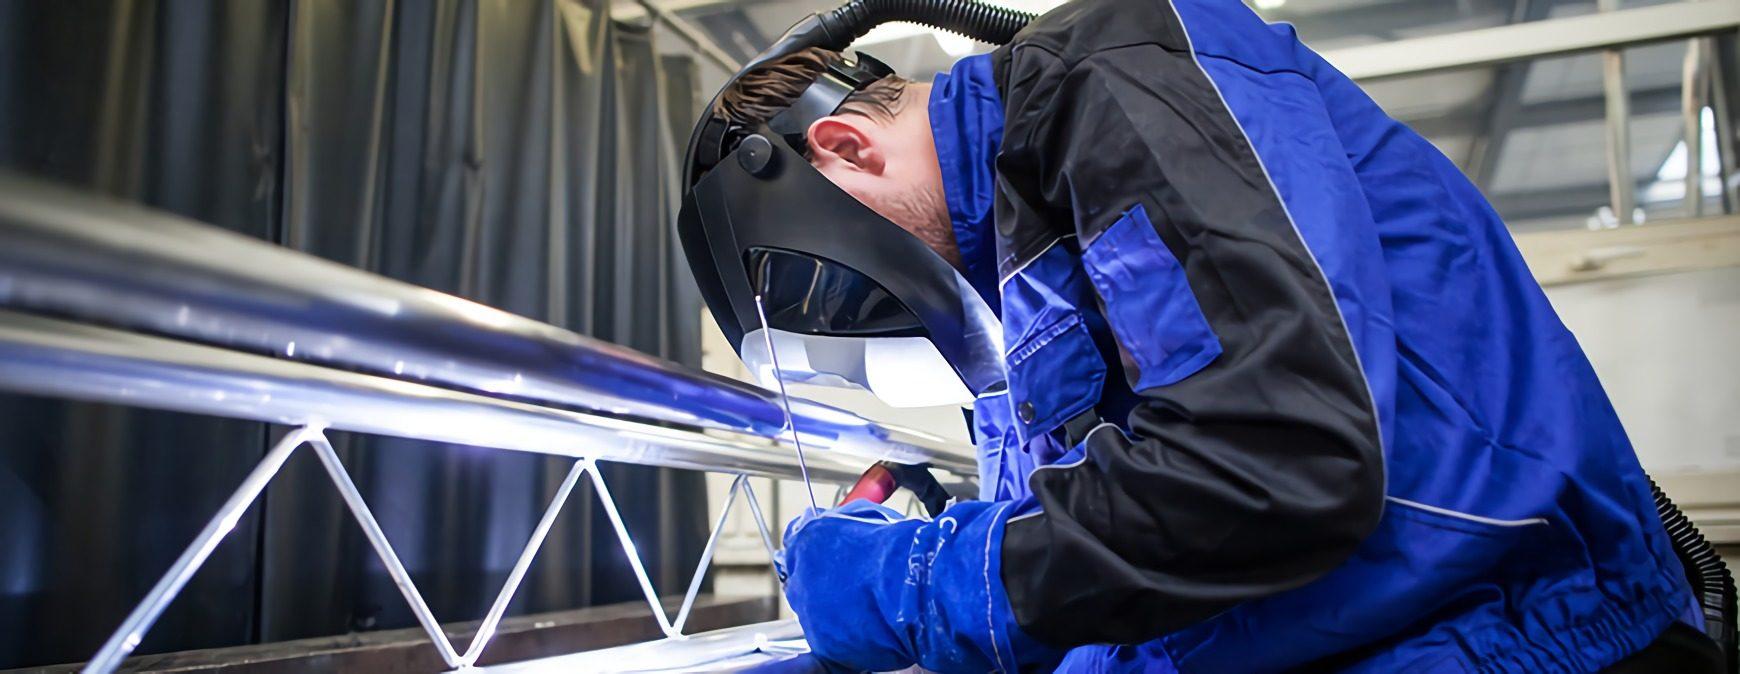 welder working on steel